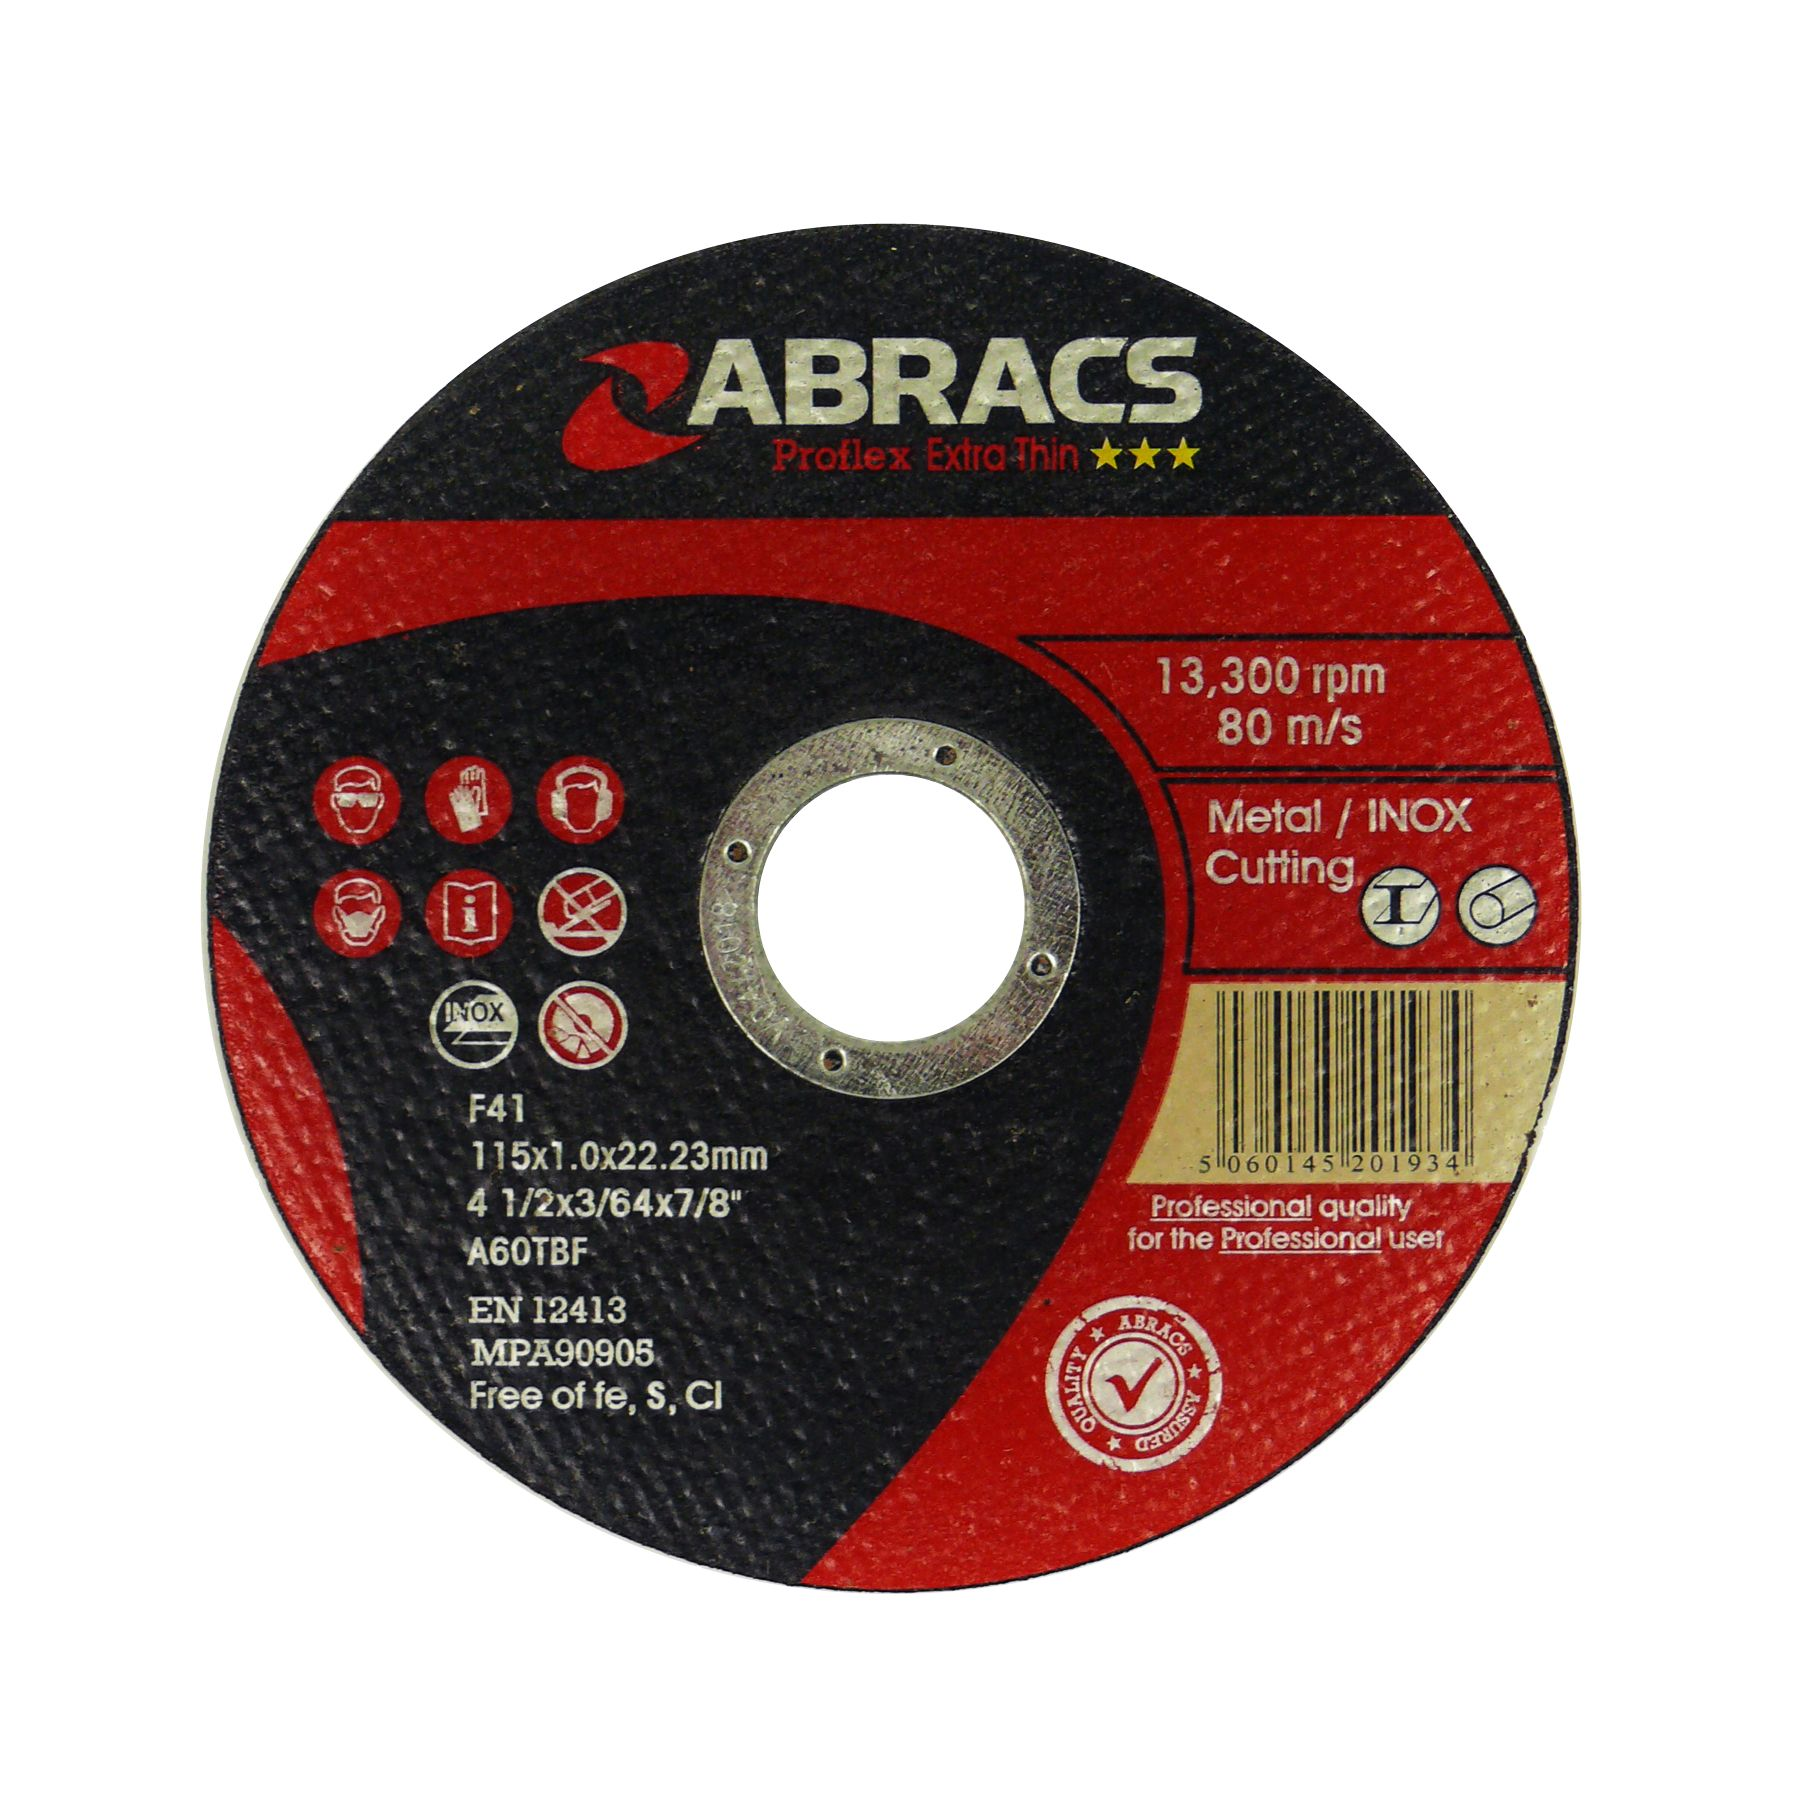 THIN METAL CUTTING DISC - FLAT 115 X 1.0 X 22.23MM